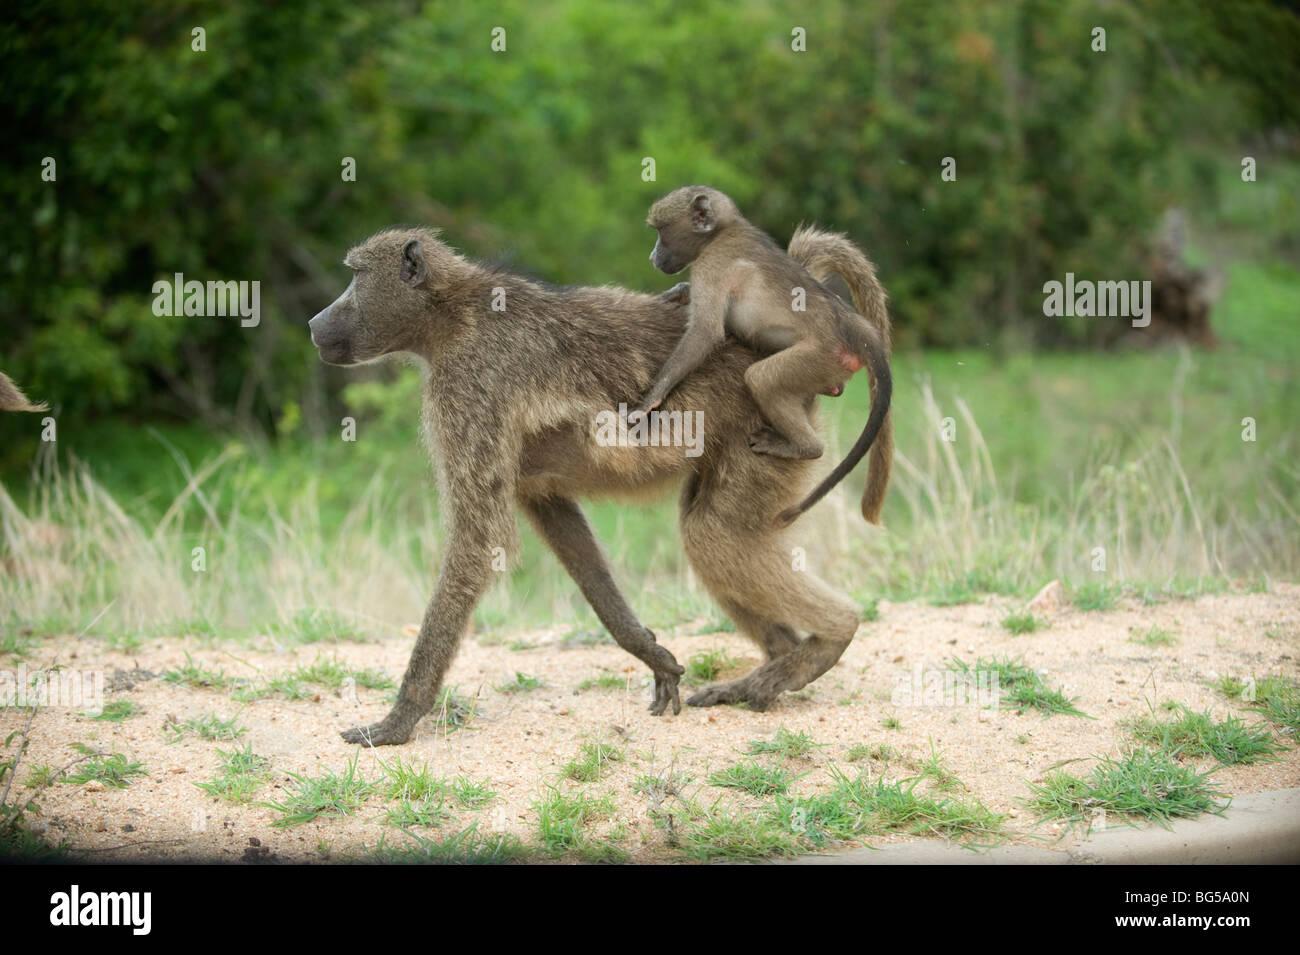 Madre di babbuino e baby, Parco Nazionale Kruger. Sud Africa/ Immagini Stock